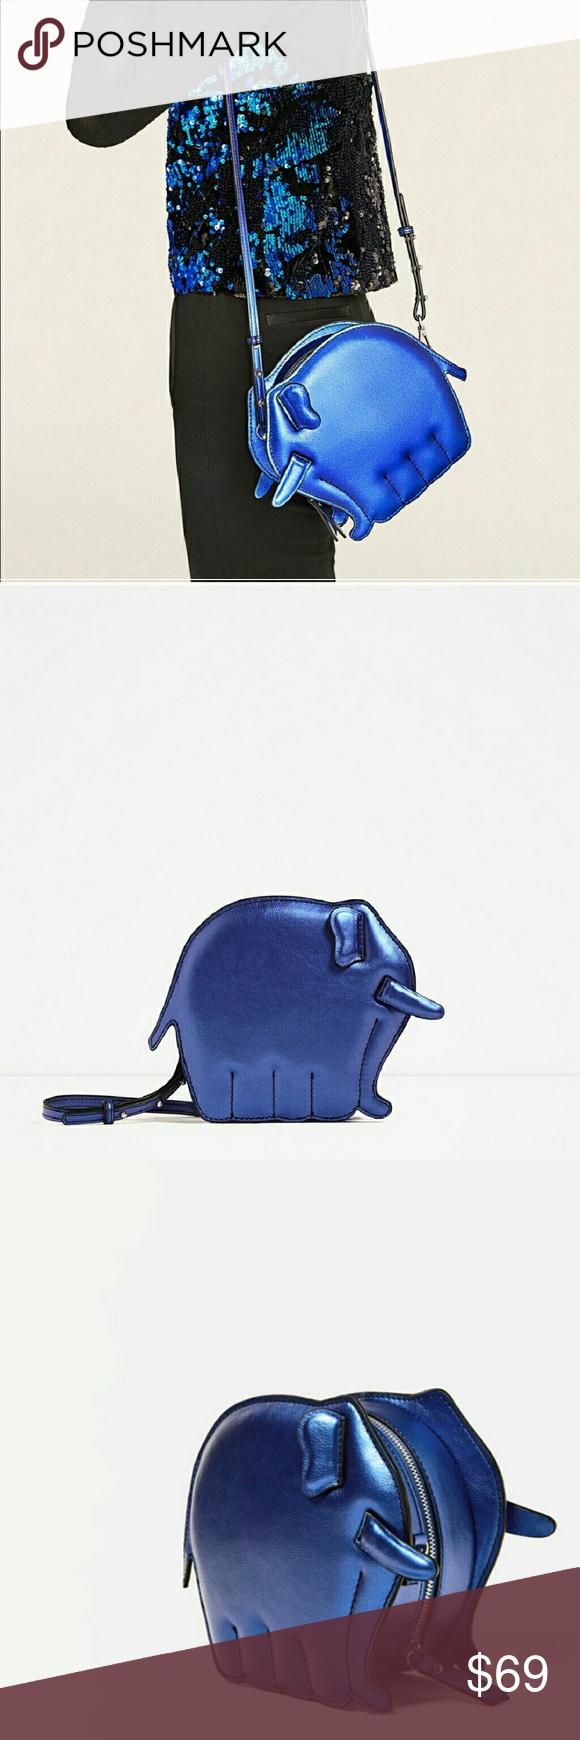 547436cfabc Zara Animal Shaped Elephant crossbody bag 4316 New with tag attached &  unworn, unused.